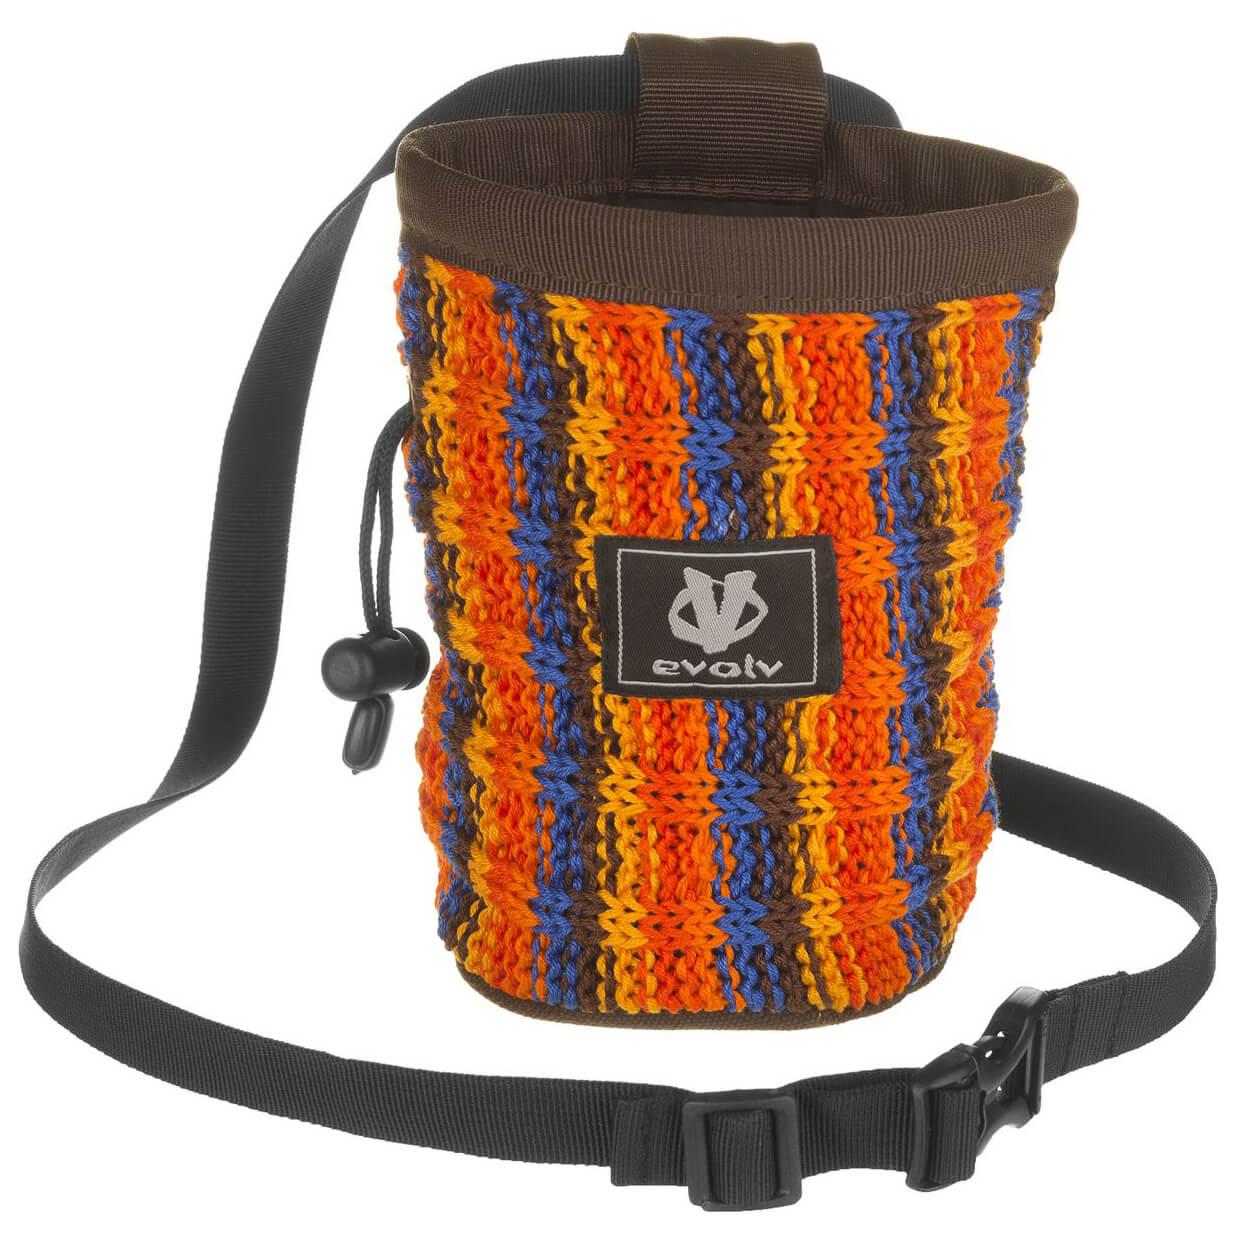 Evolv Knit Chalk Bag Buy online Alpinetrek.co.uk